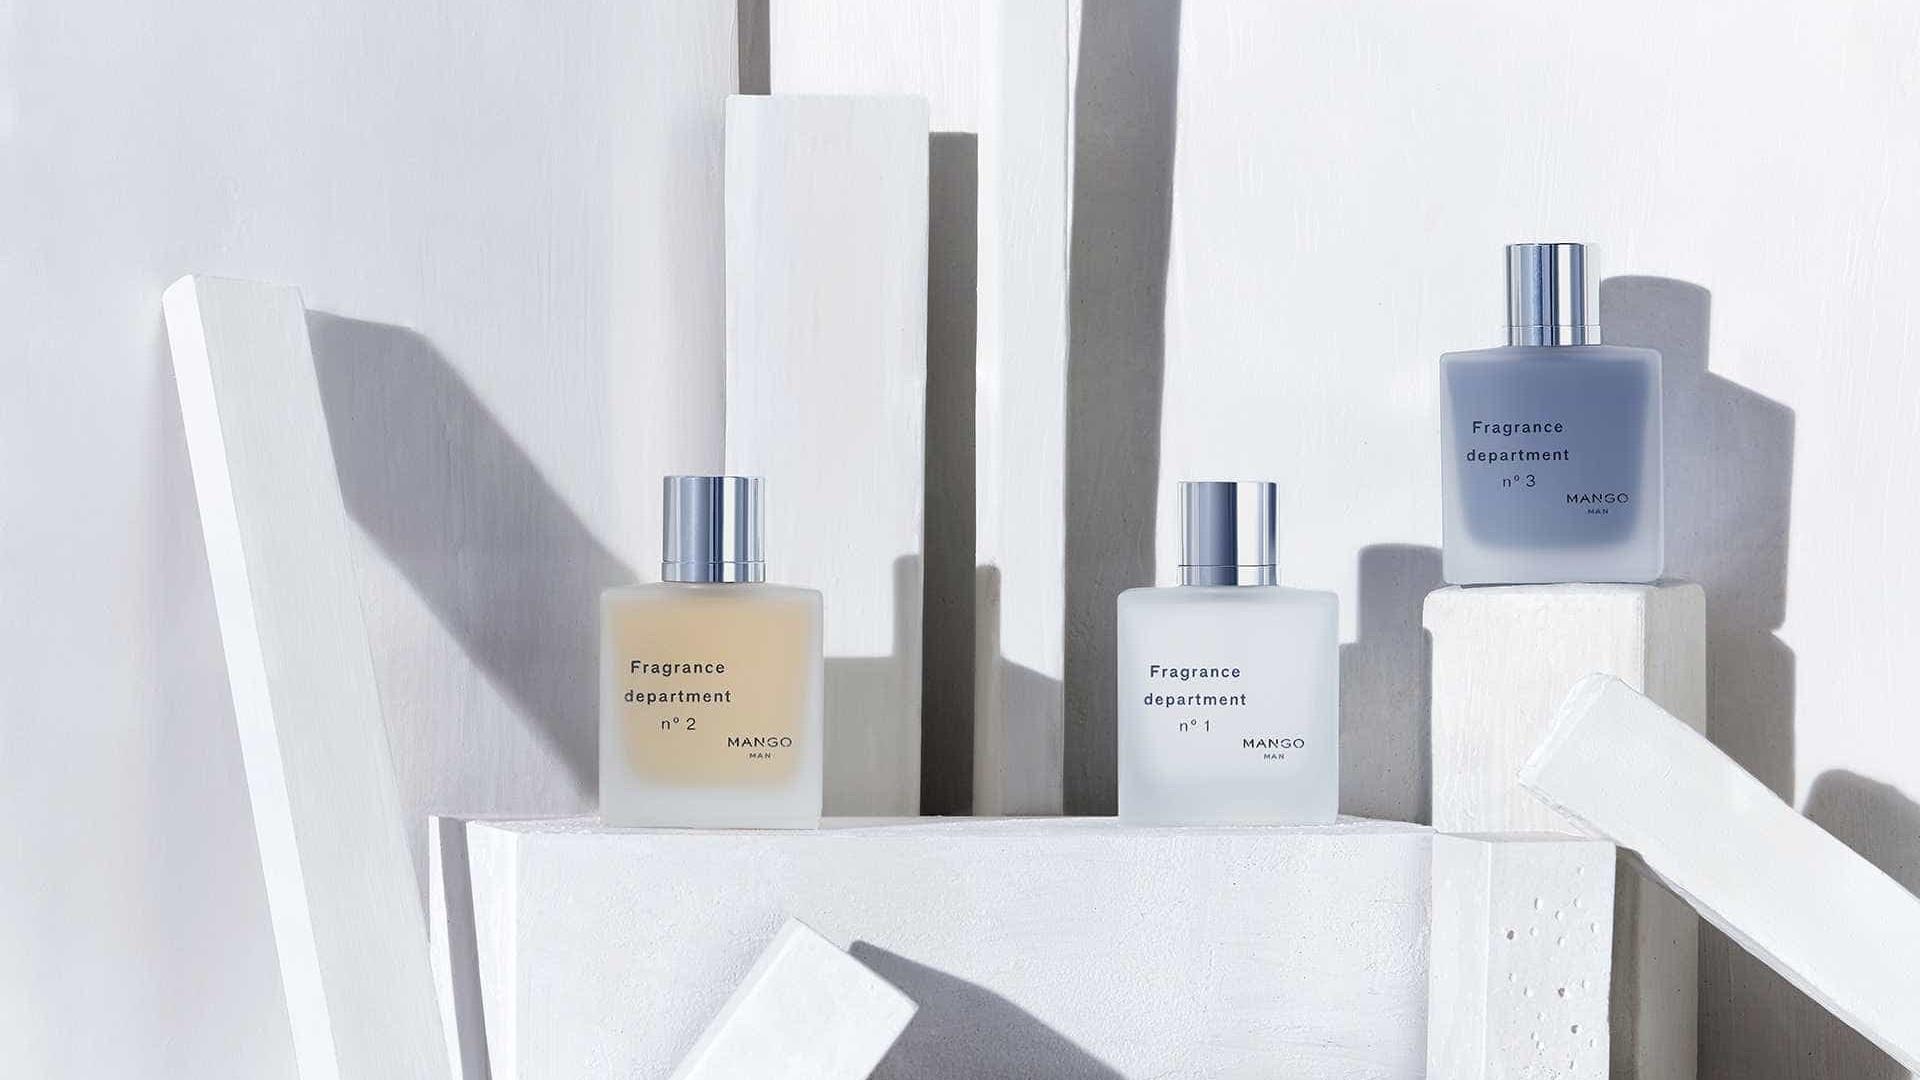 Fragrance Department. Mango lança nova linha de perfumes masculinos